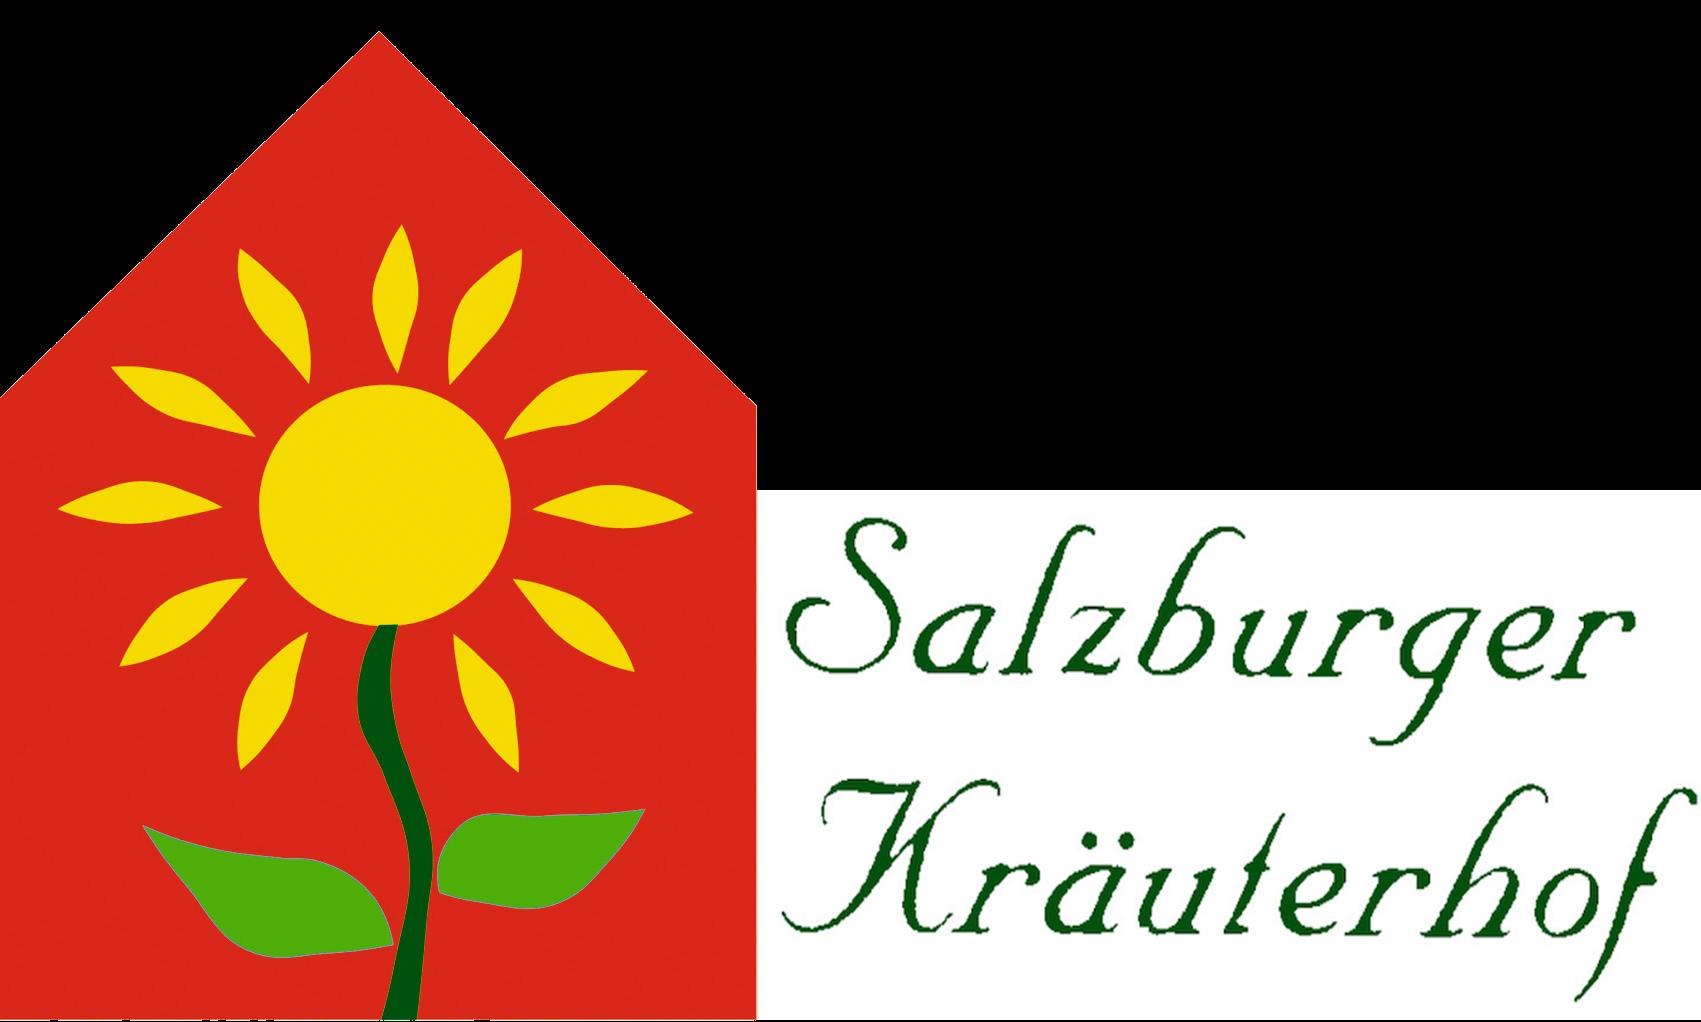 Salzburger Kräuterhof